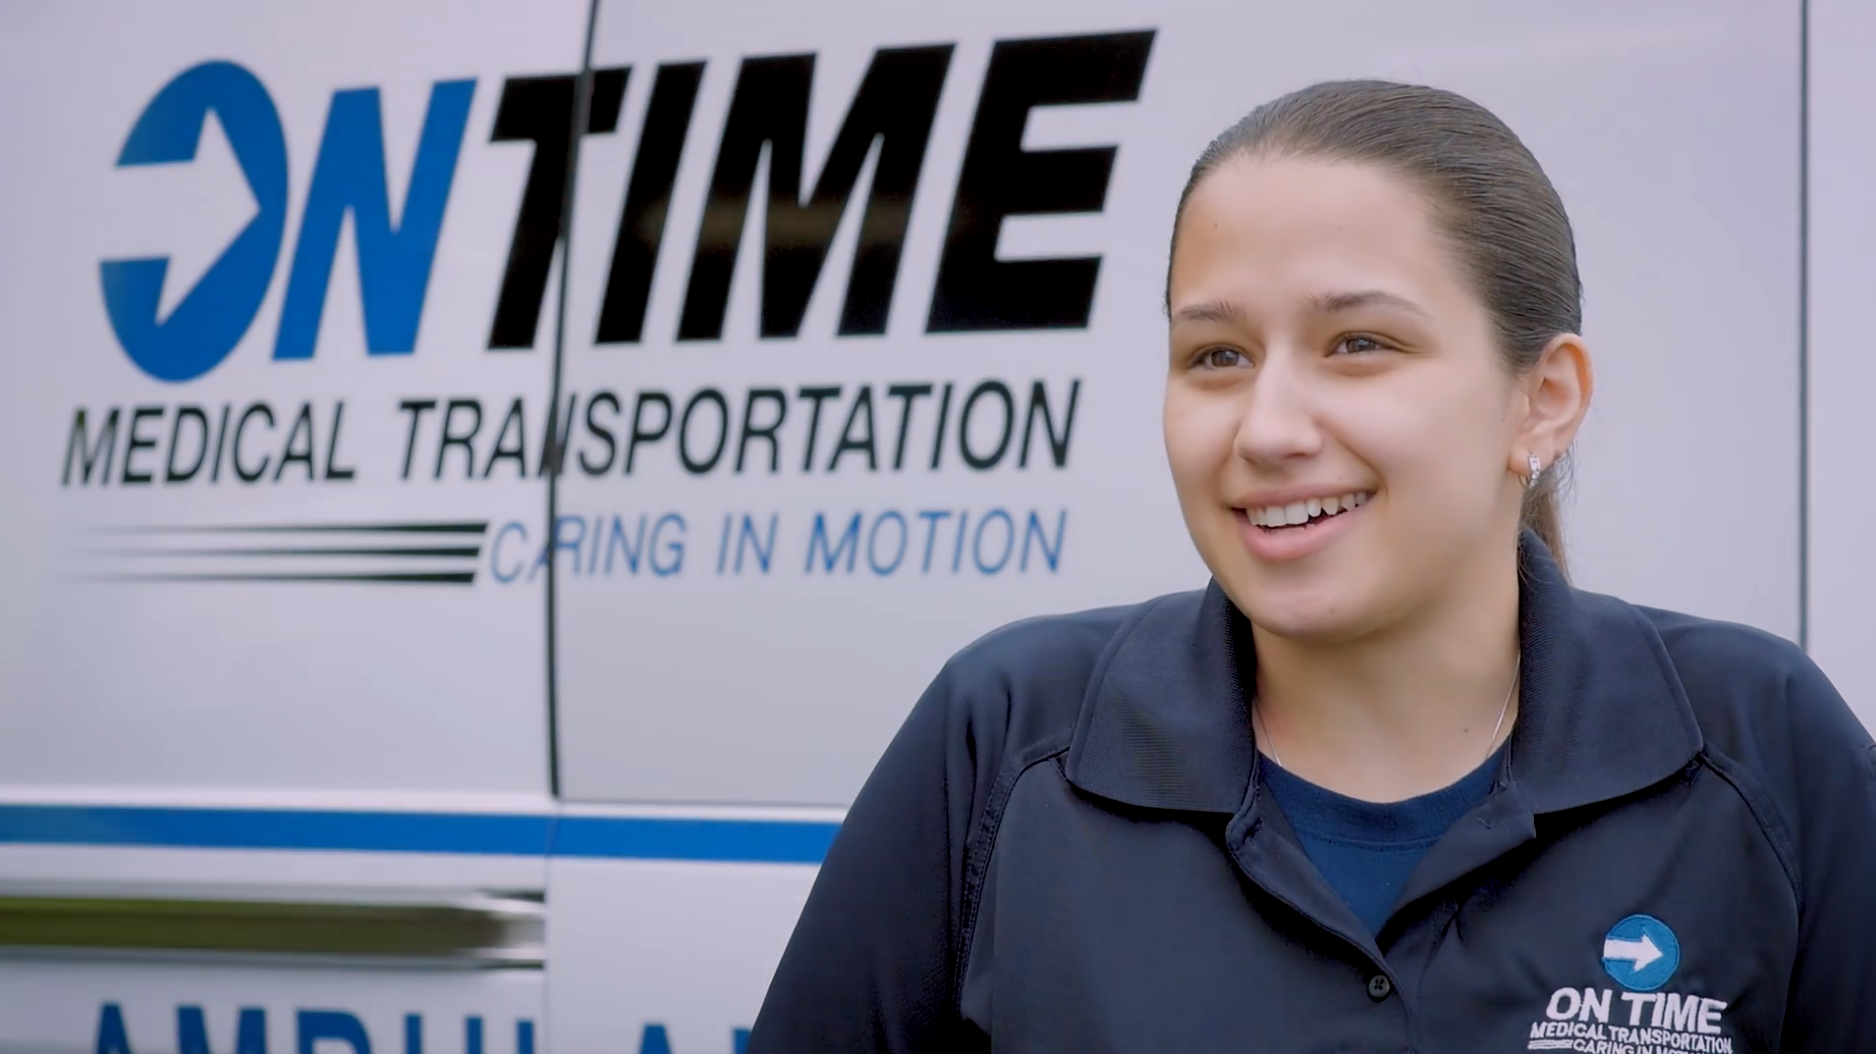 On Time Ambulance | EMS Careers Egg Harbor City NJ